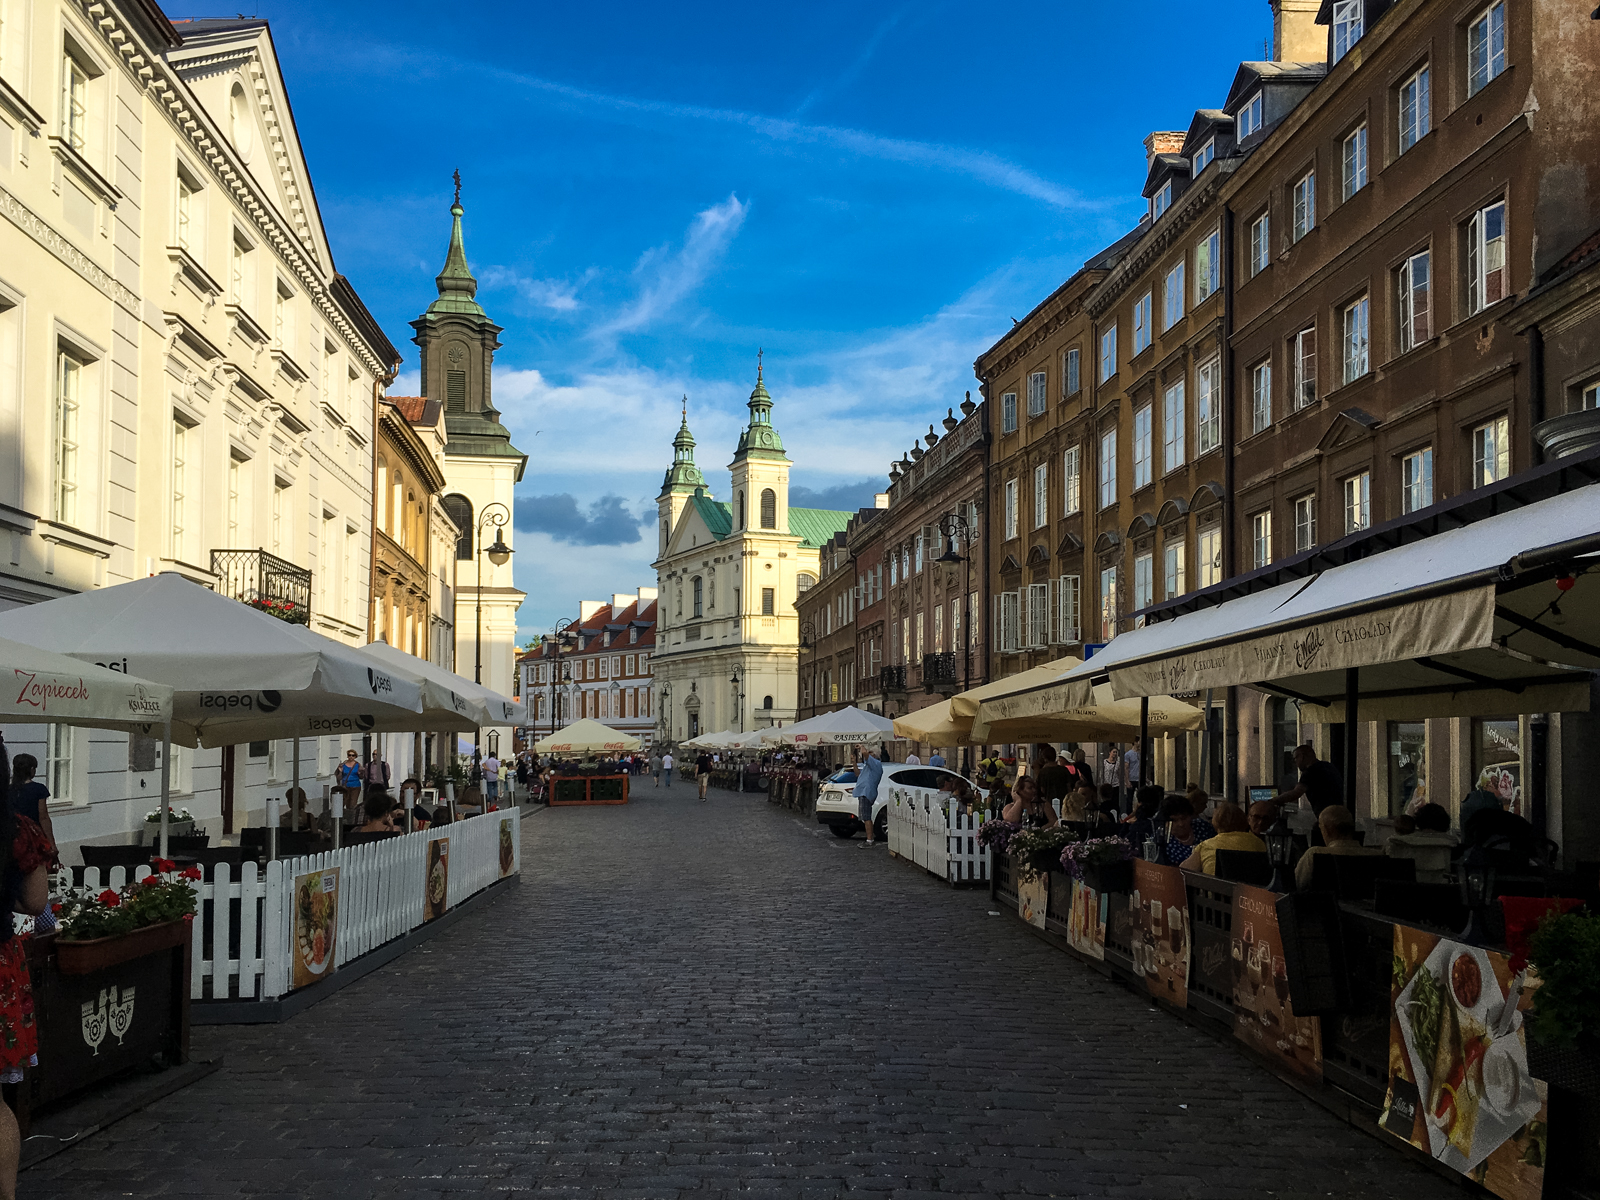 Poland_Germany_June2017-29.jpg